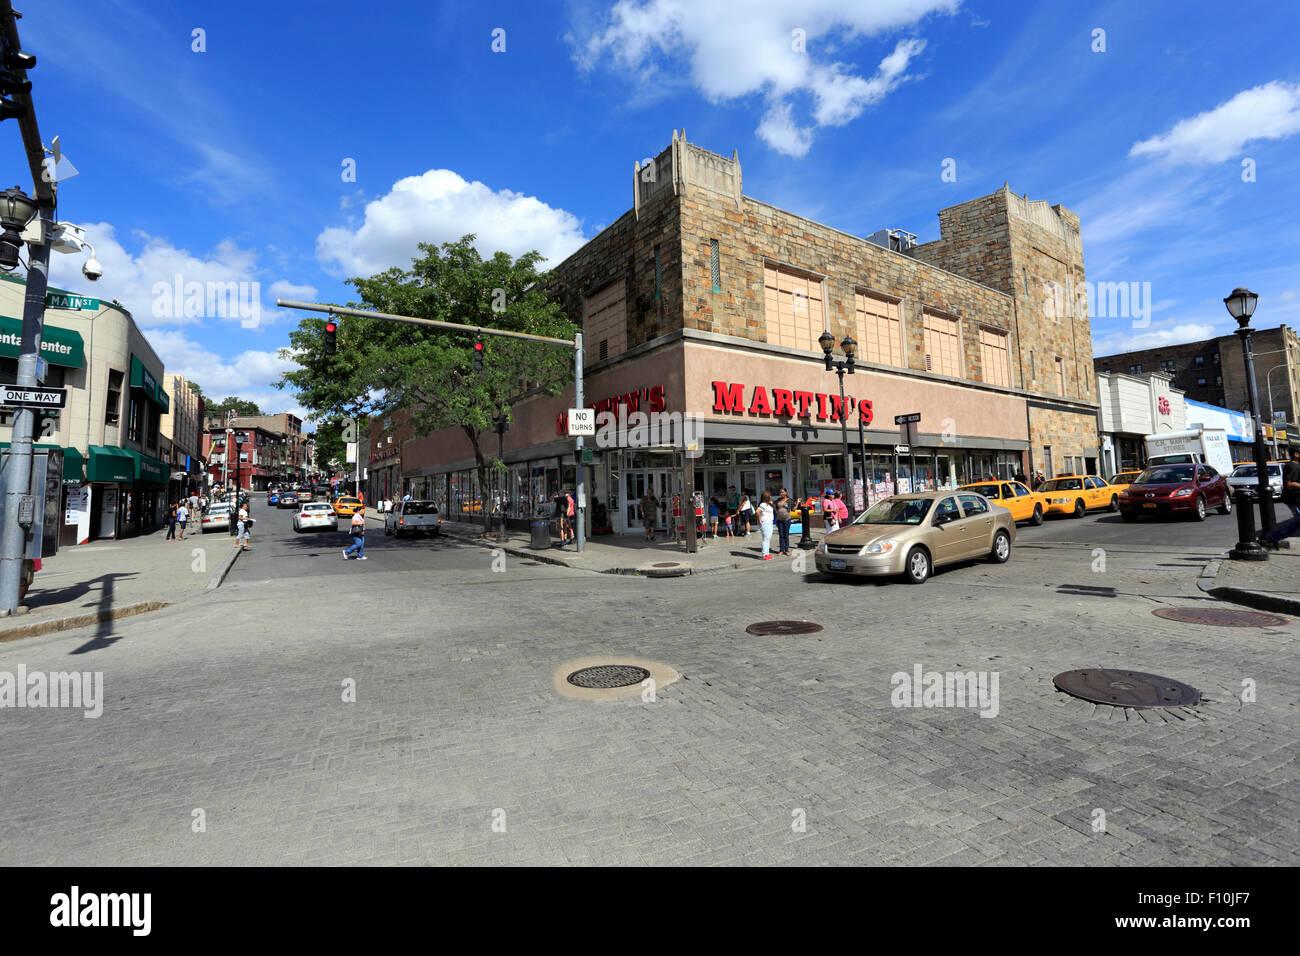 buy naproxen new york yonkers